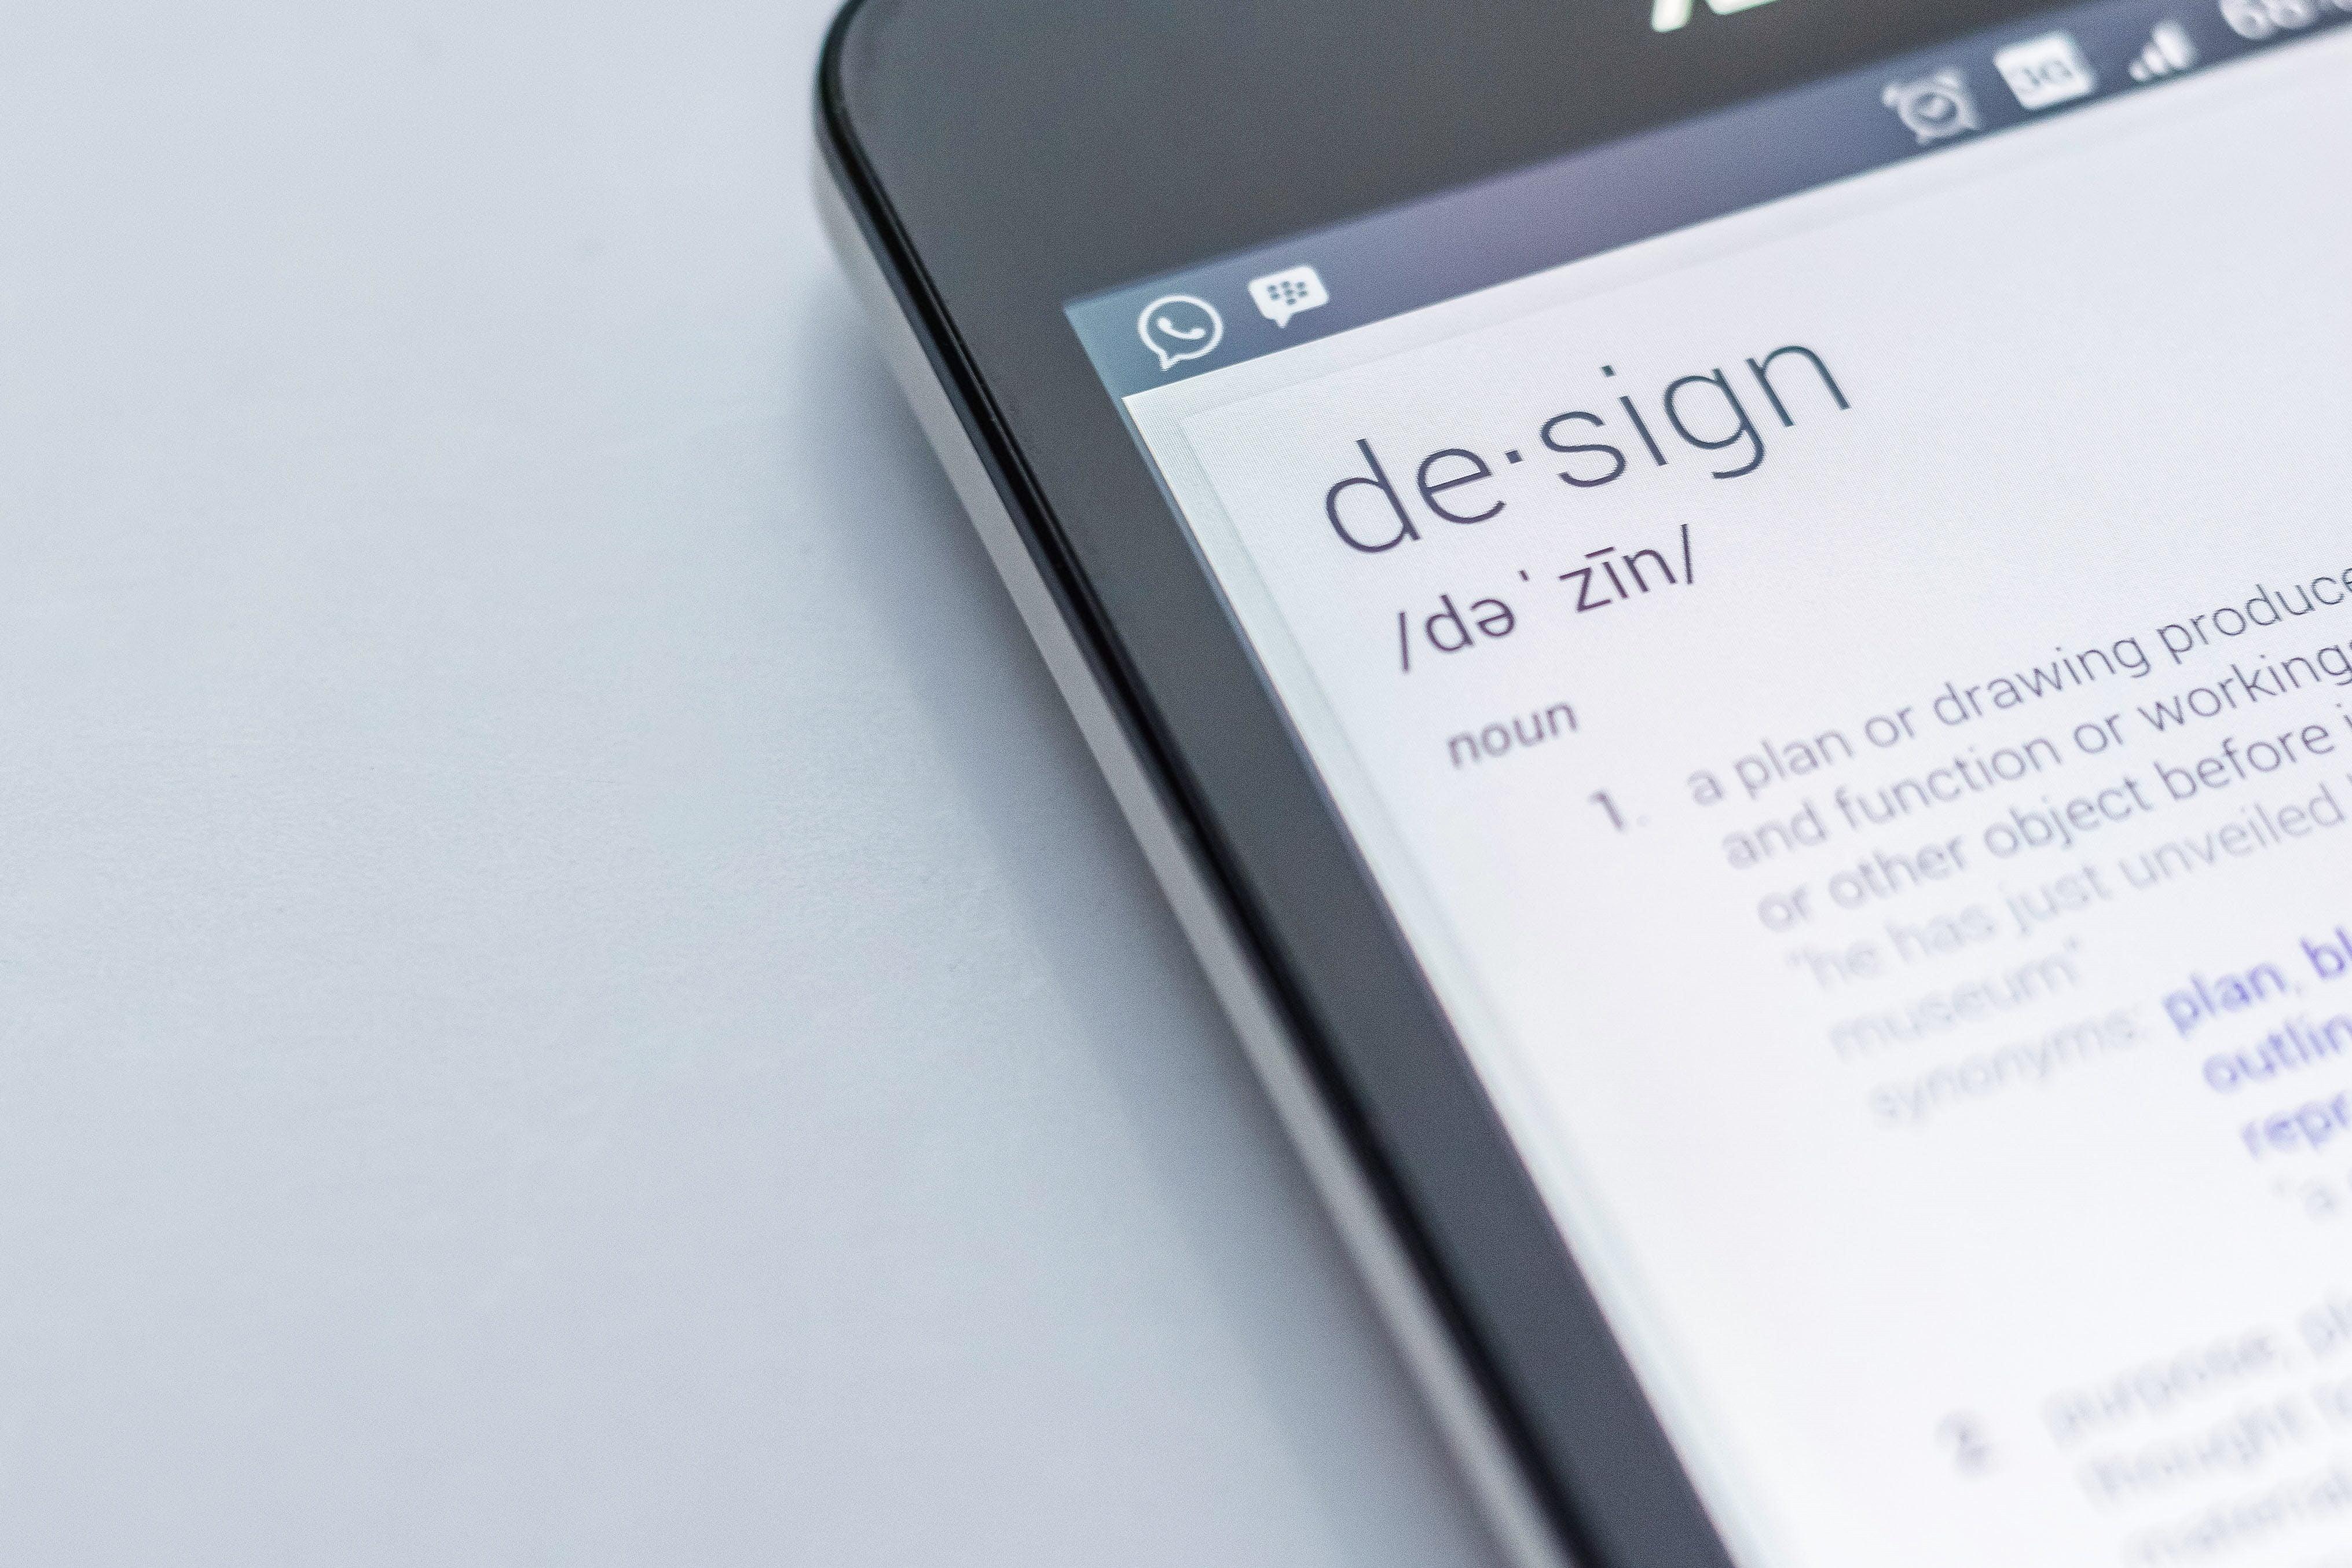 design with user, principles for digital development, rules, soldevelo foundation